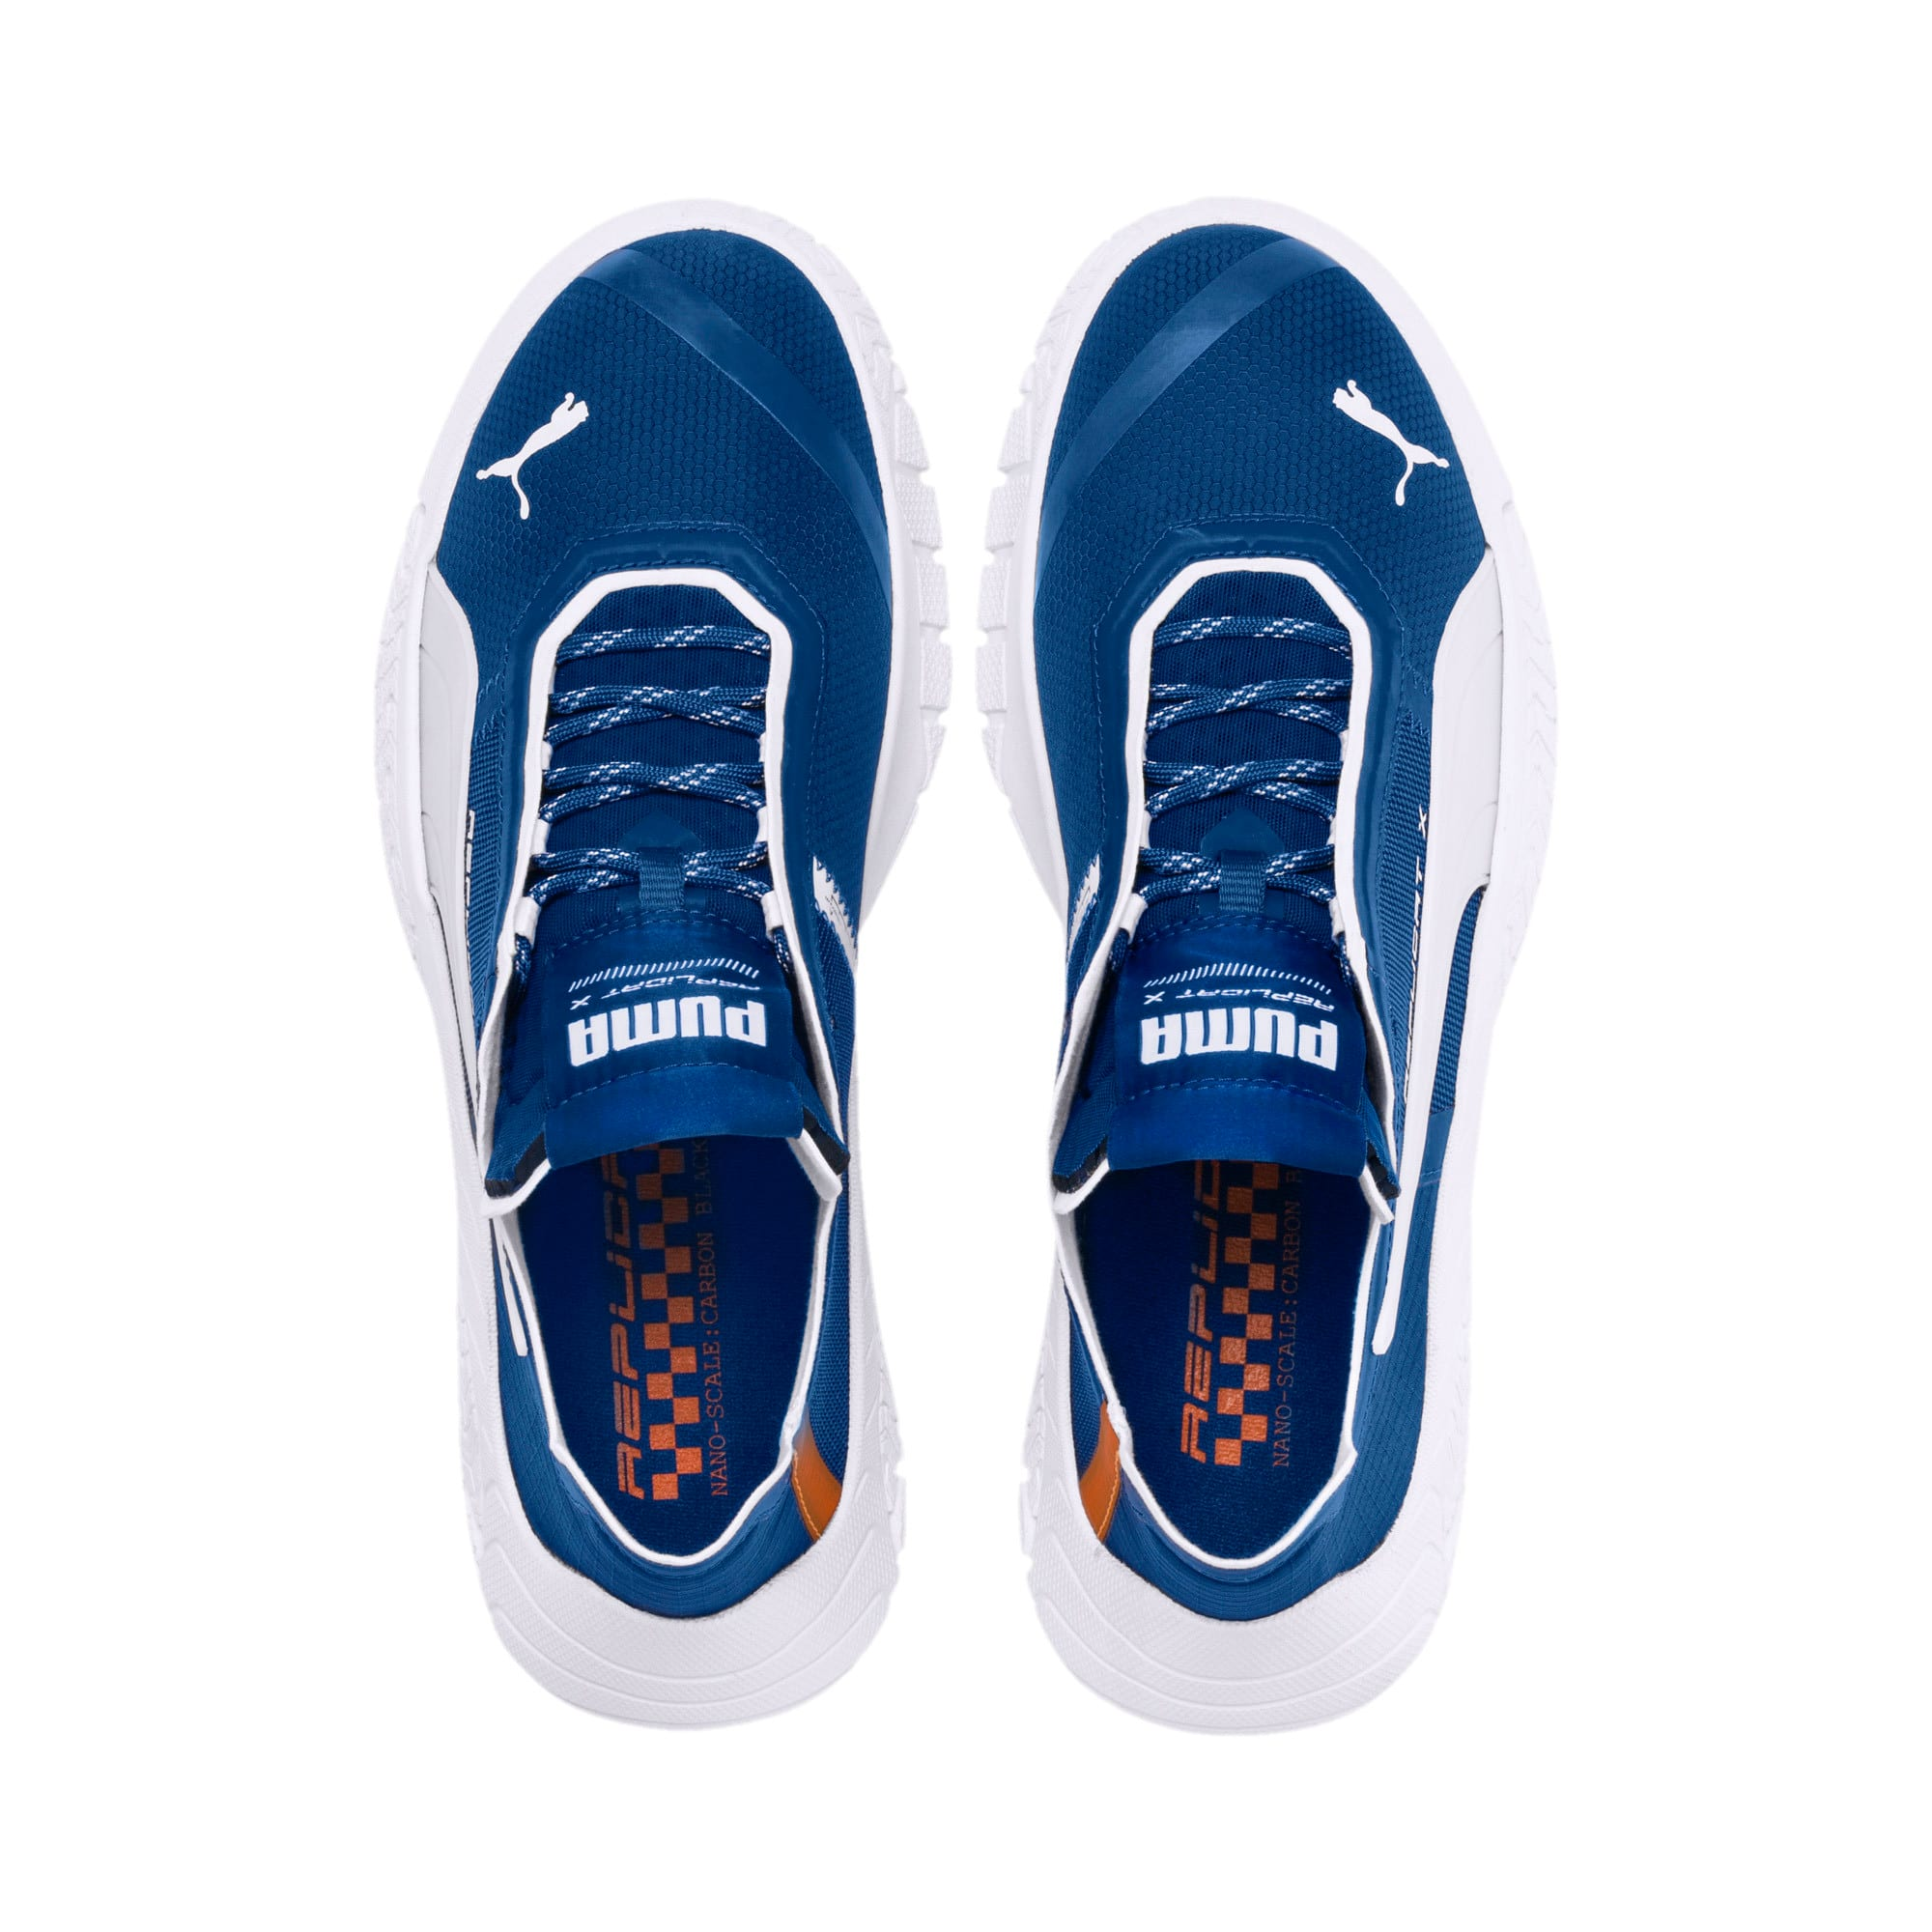 Thumbnail 6 of Replicat-X Circuit Motorsport Shoes, Galaxy Blue-Puma White, medium